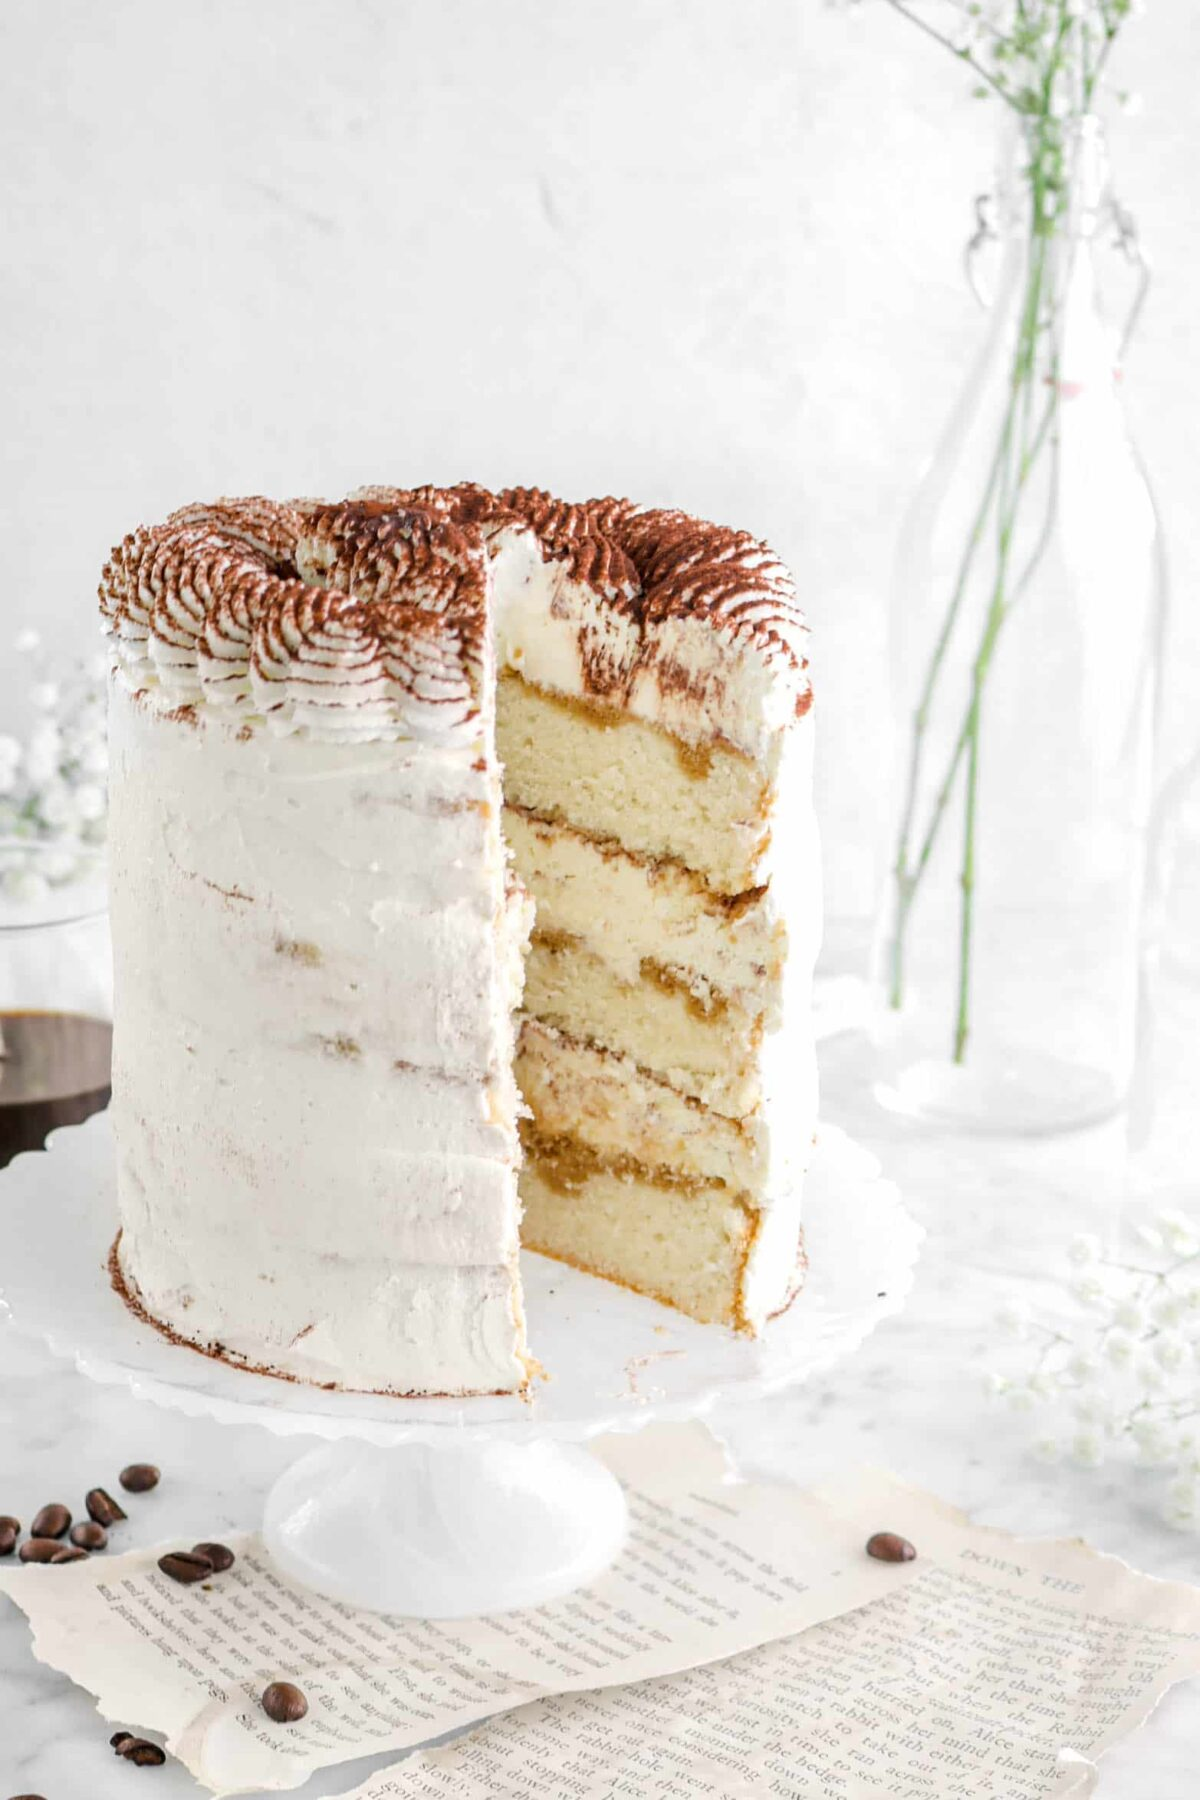 close up of tiramisu cake with slice missing